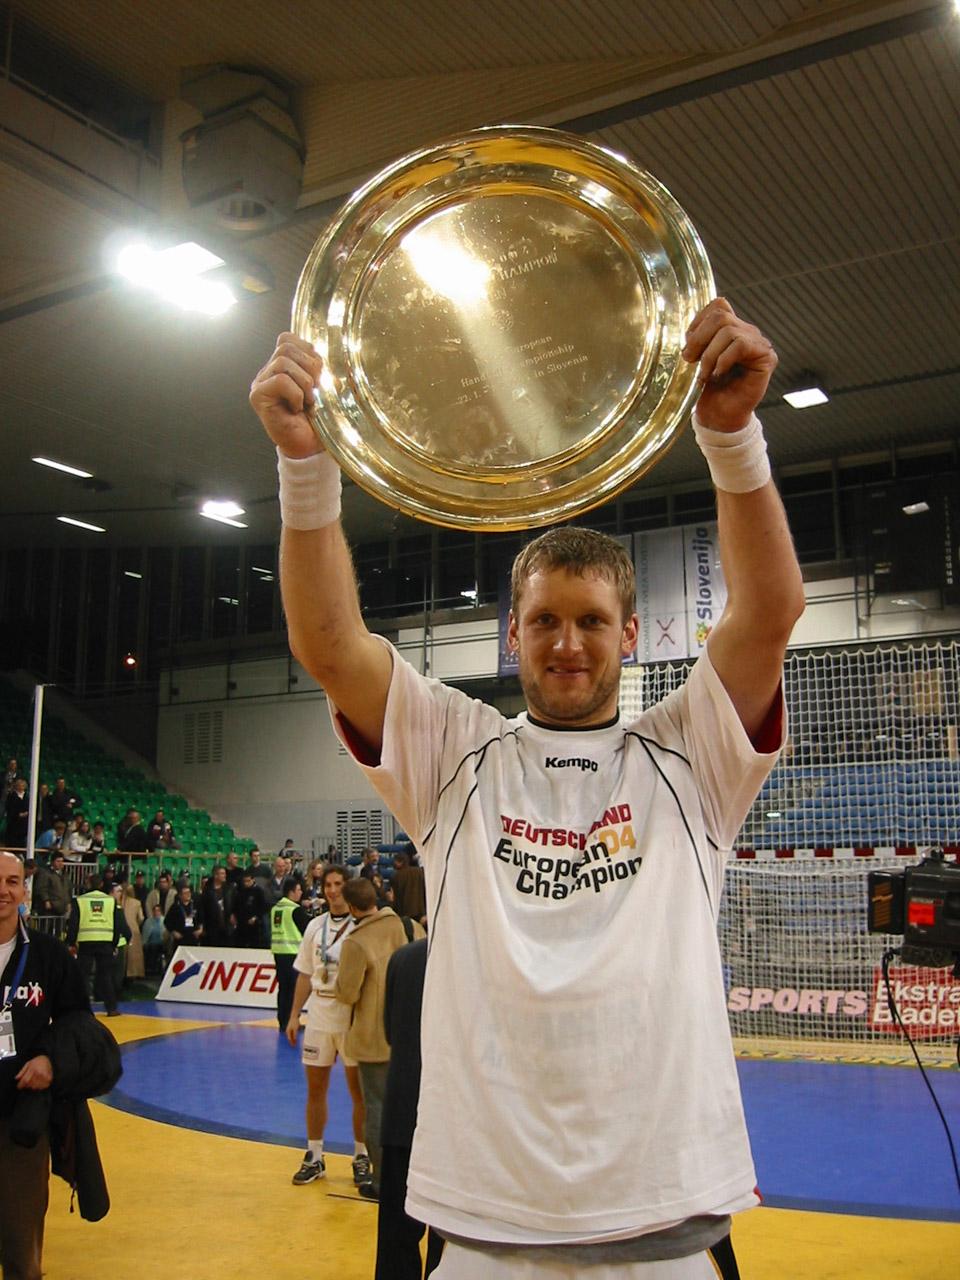 2004 Der Kapitän - Europameister